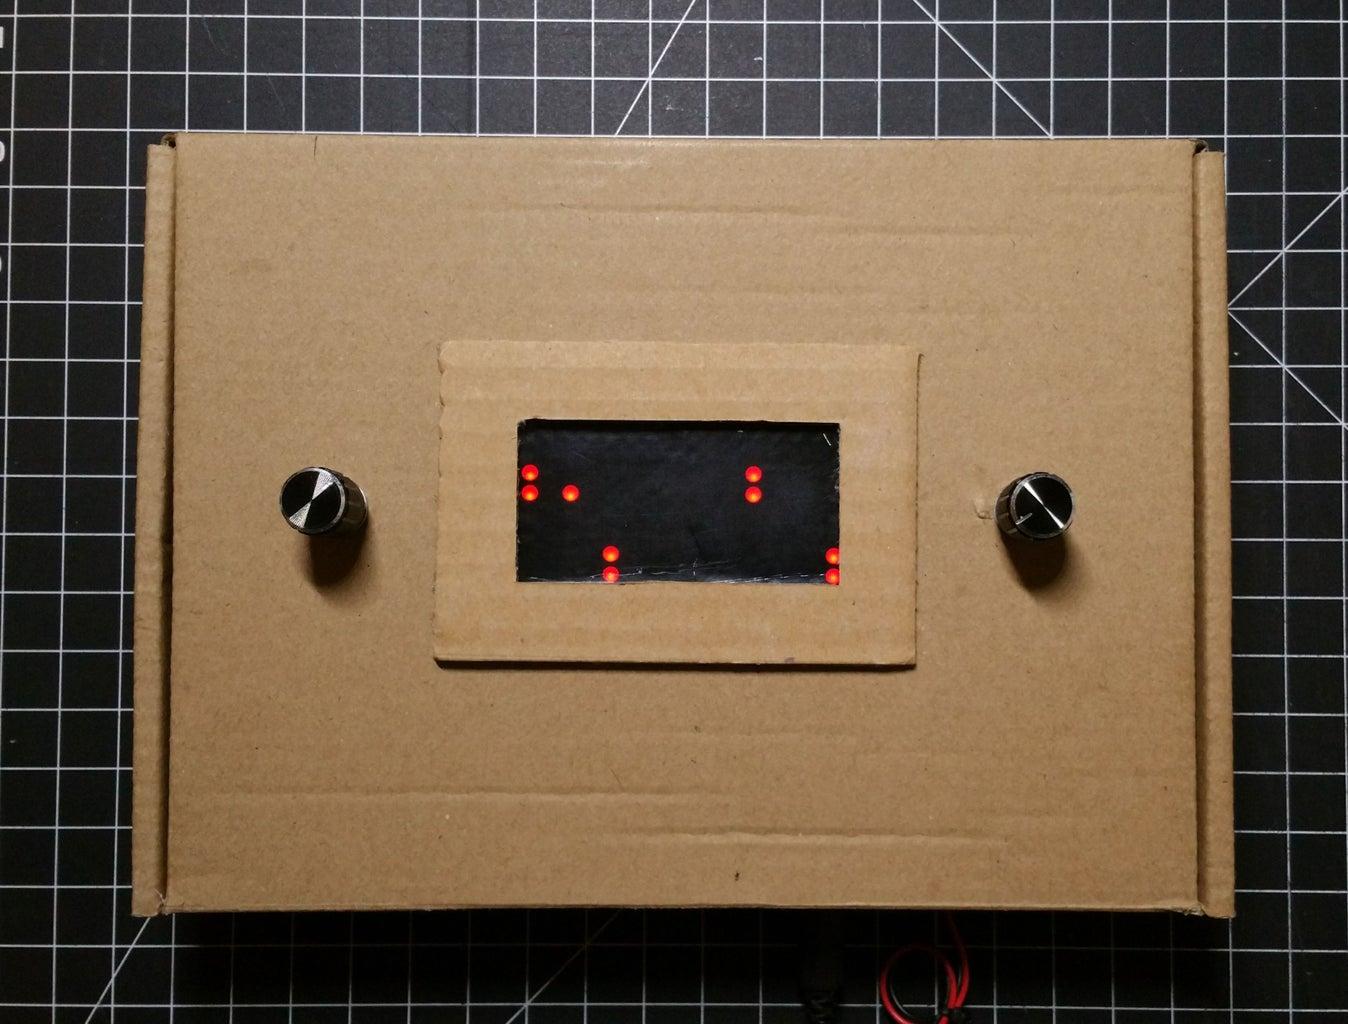 8x16 LED Matrix Pong Game (2 Paddles Per Player Version)